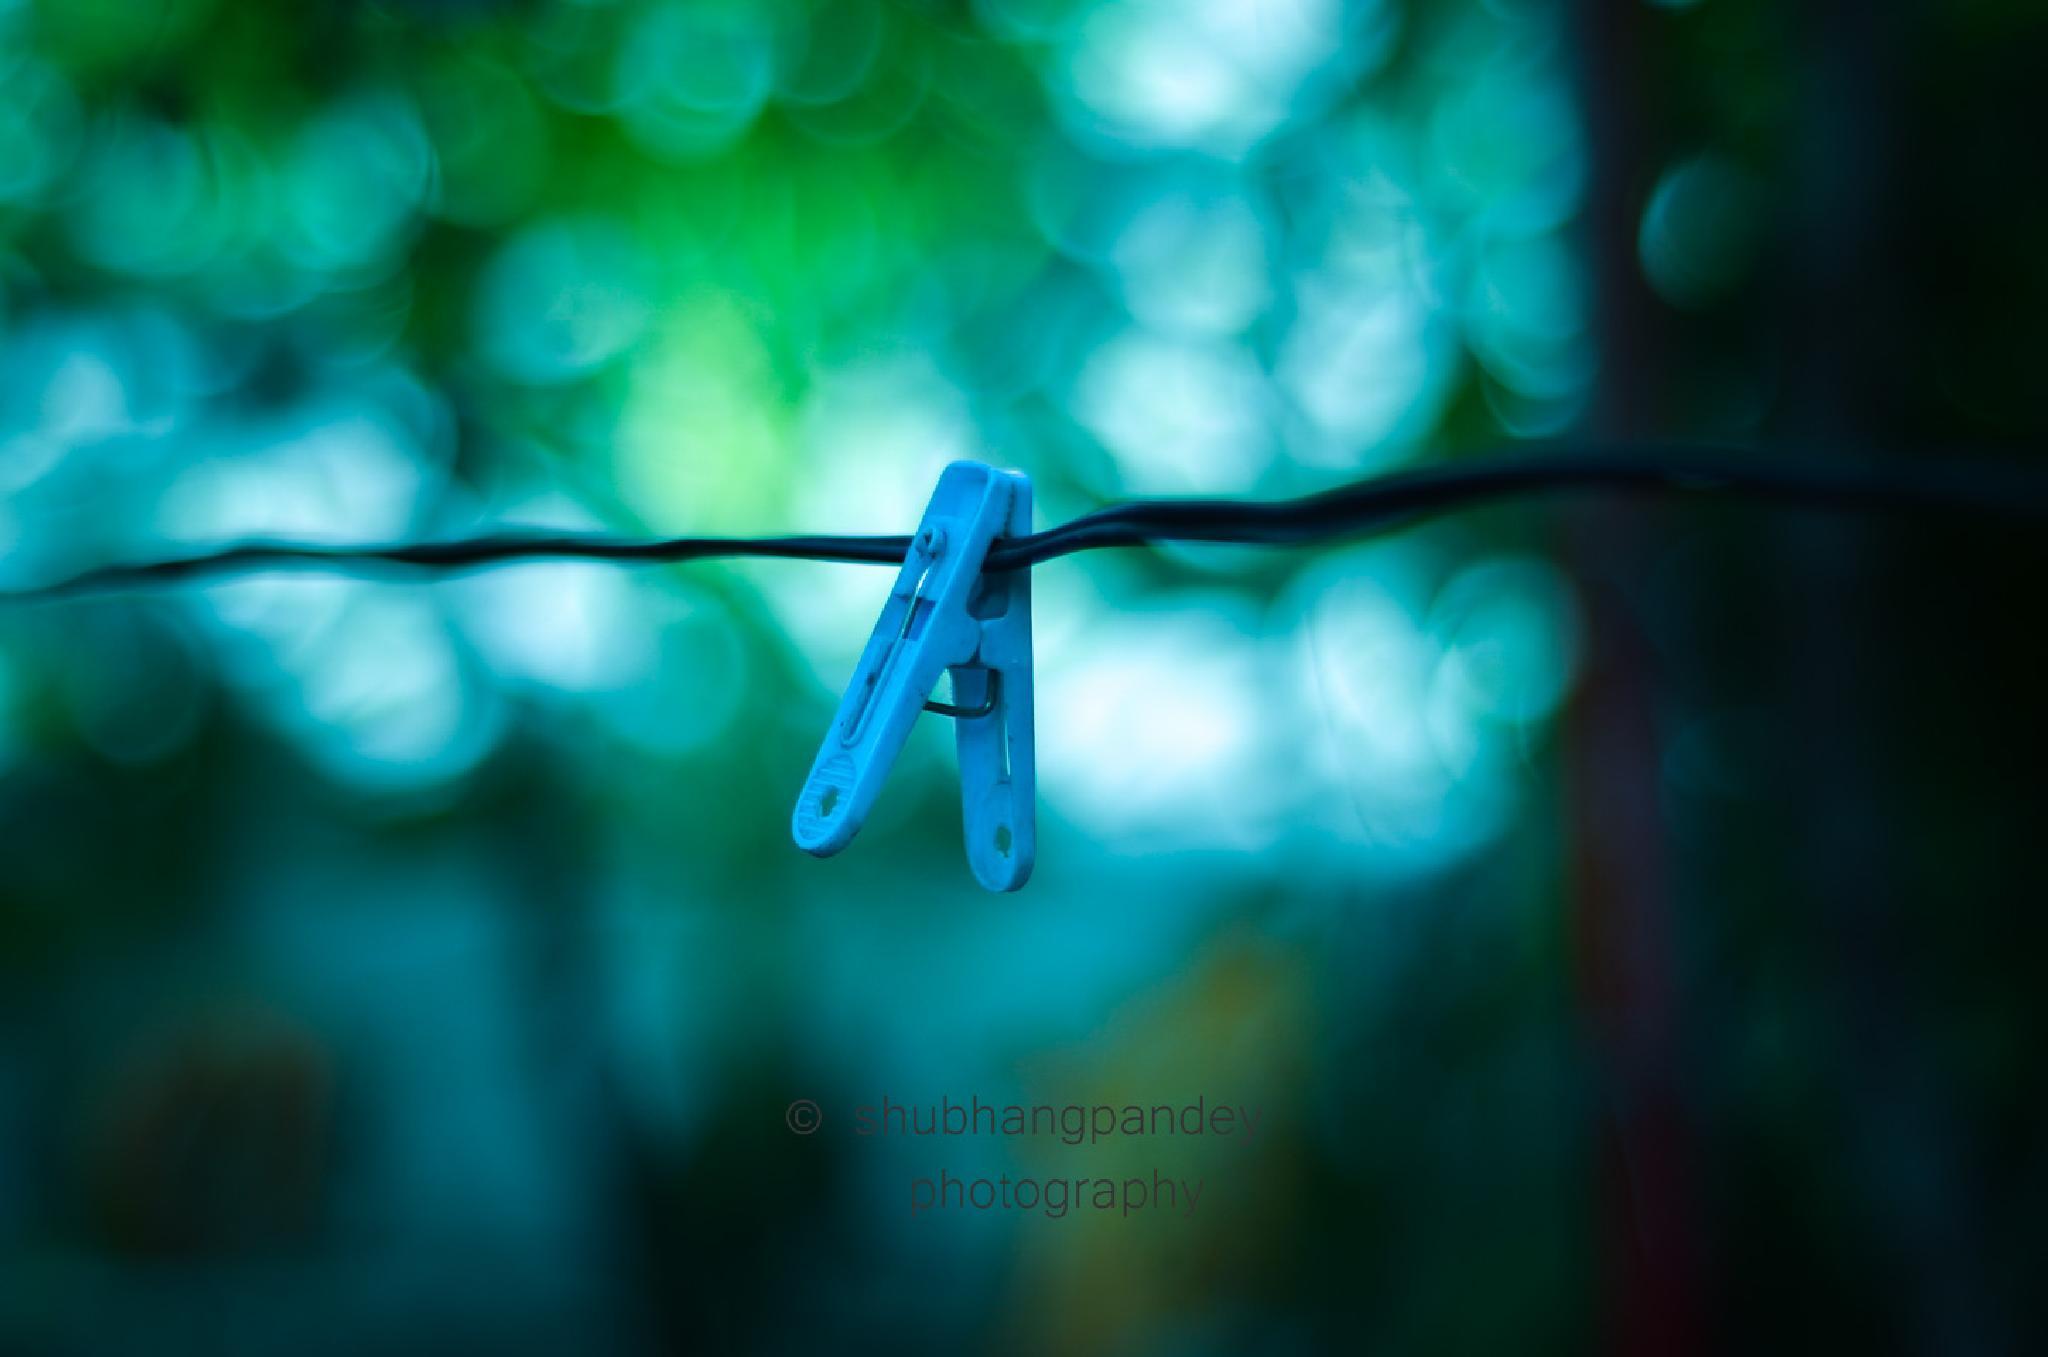 Alone..... by Shubhang